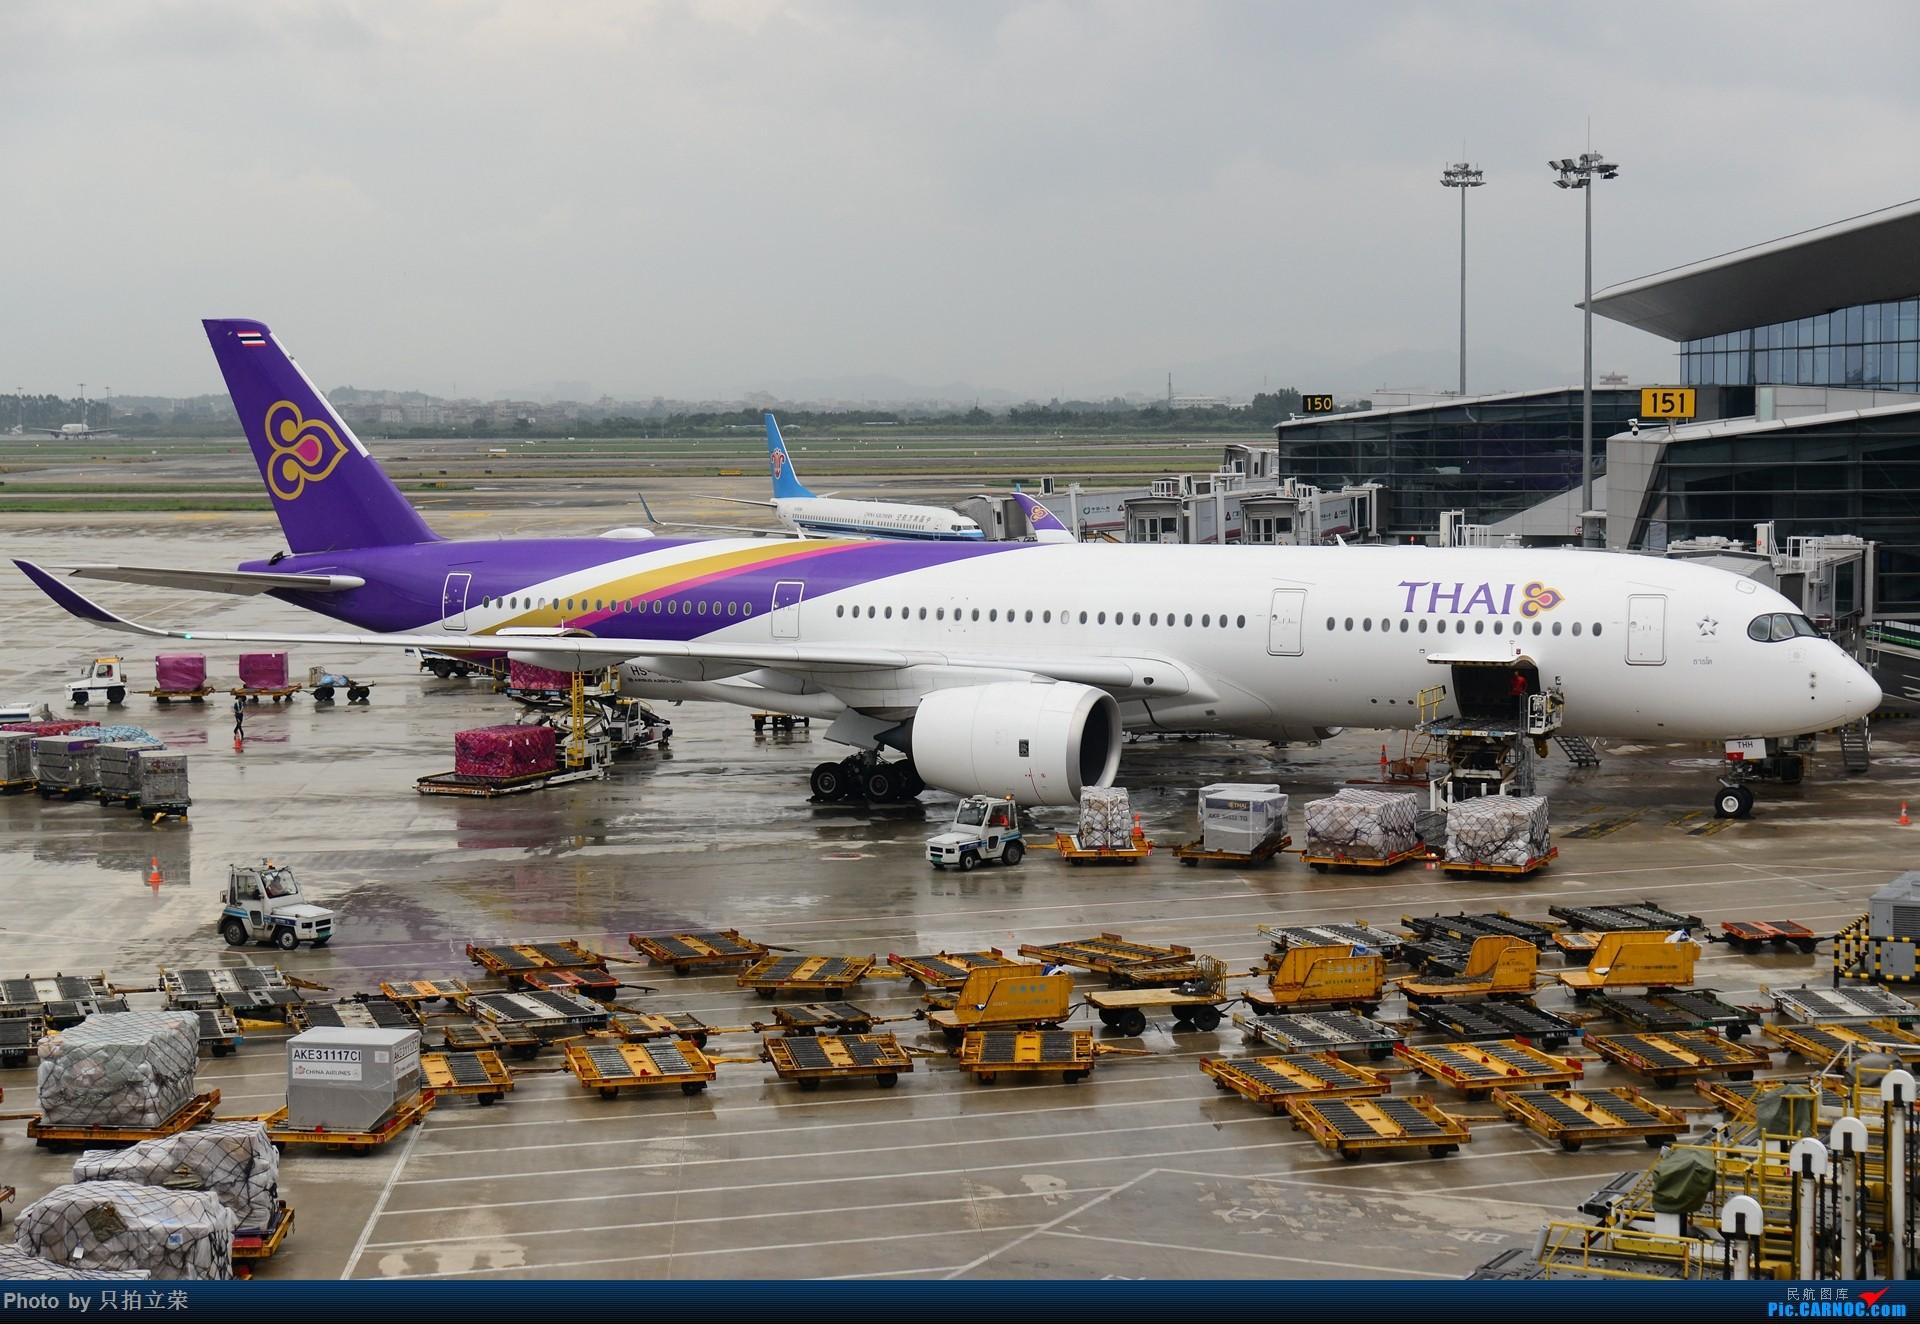 Re:[原创]湖南飞友会:只拍立荣回归。马来之旅航站楼杂图一堆。 AIRBUS A350-900 HS-THH 中国广州白云国际机场